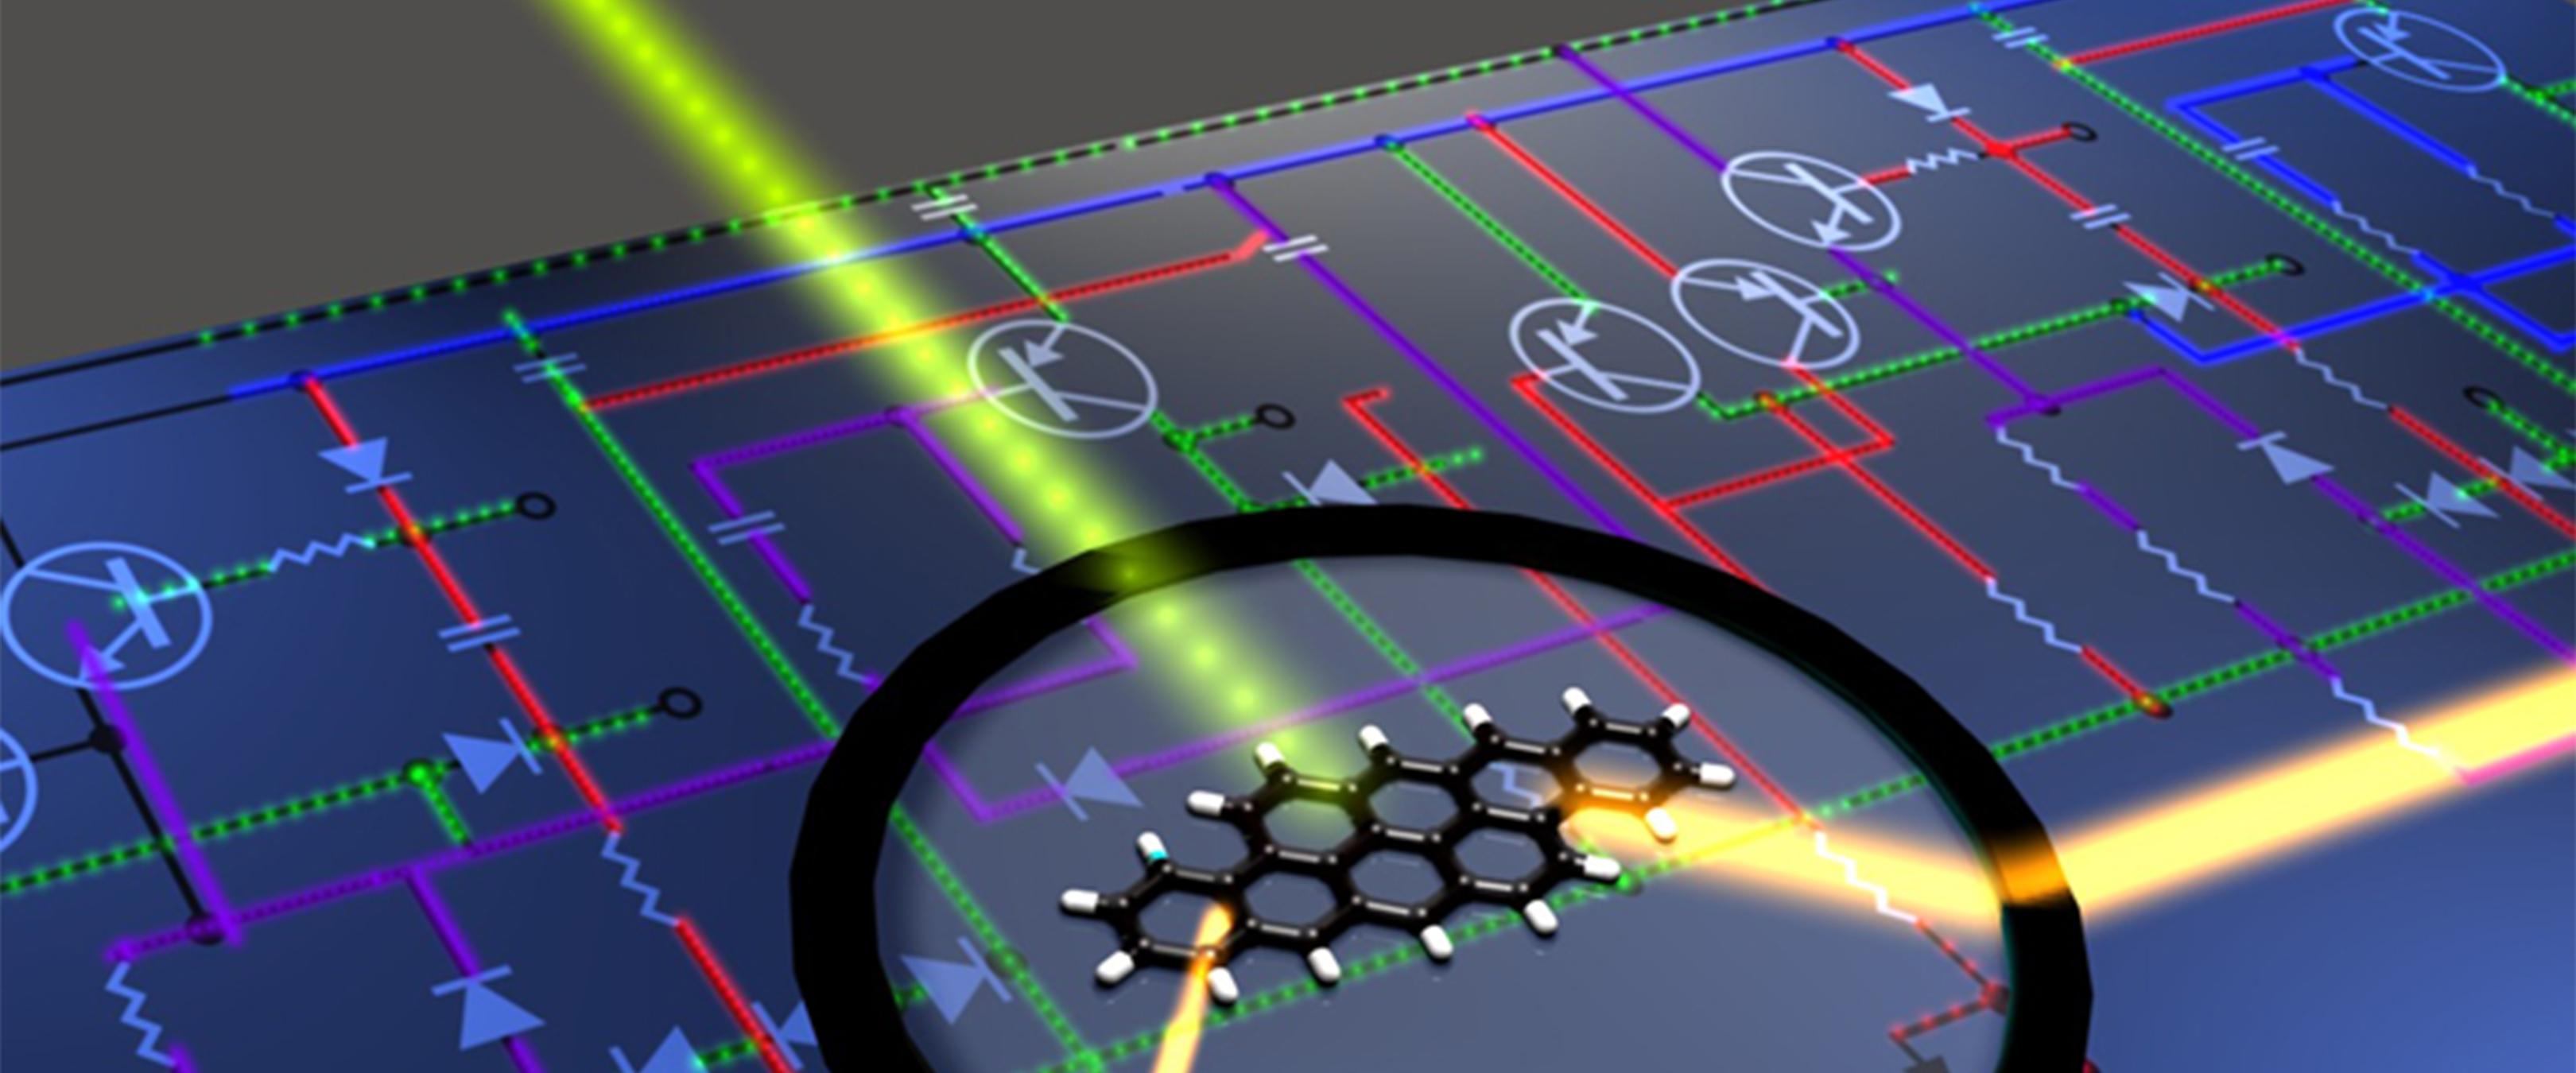 Photonics, Electronics and Nanotechnology | College of Engineering